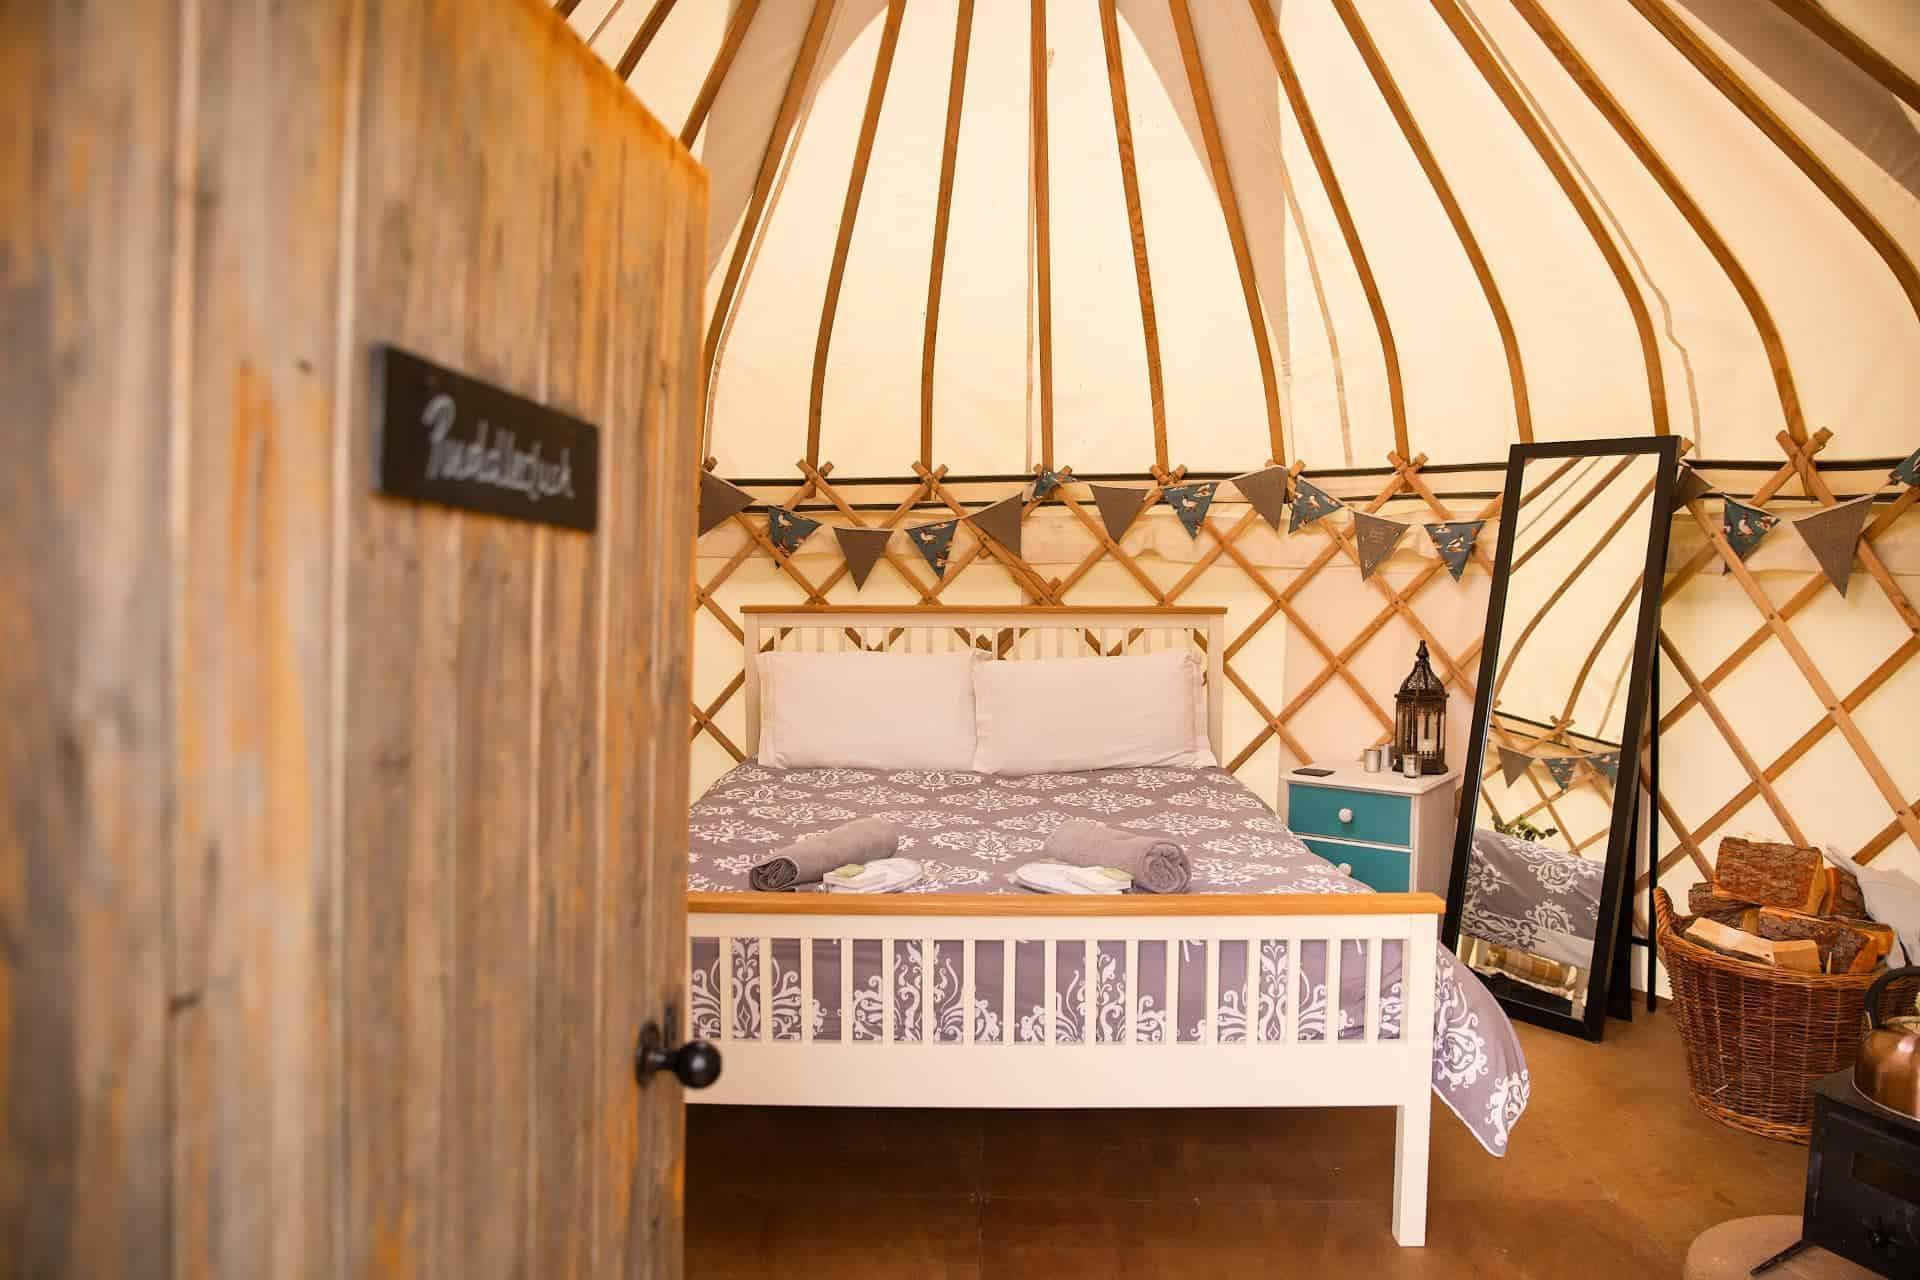 Country Bumpkin Yurts Dog Friendly Northamptonshire